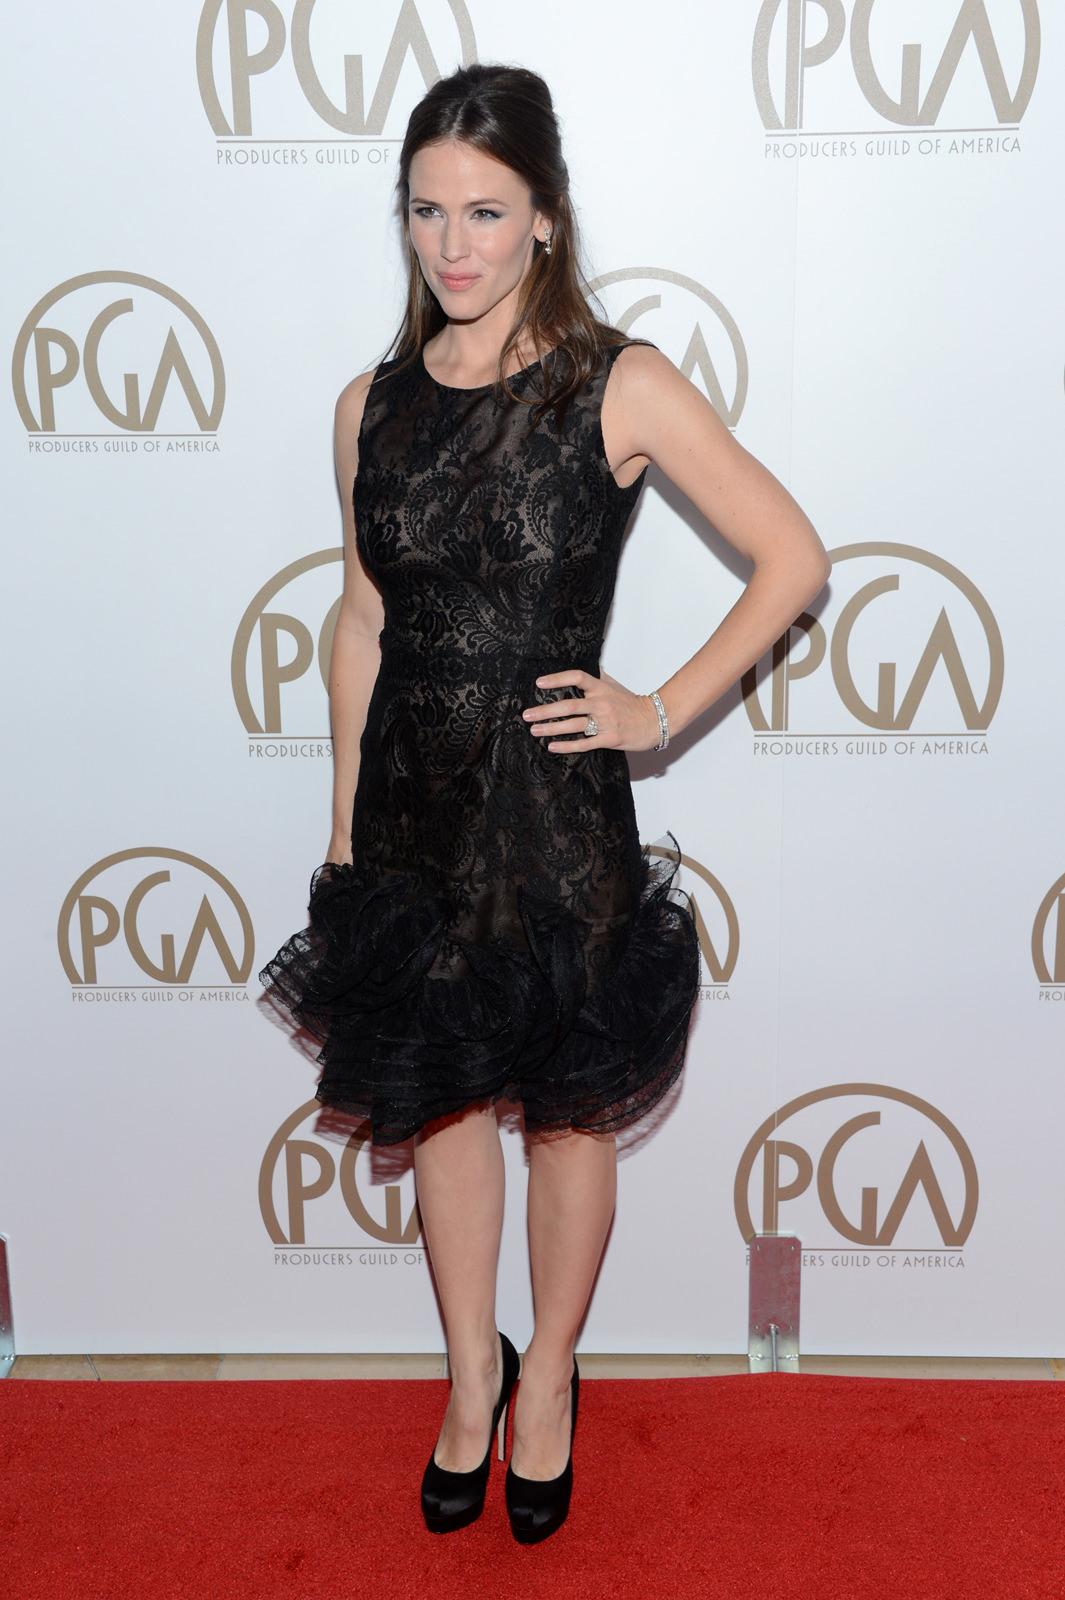 Jennifer Garner Photo Gallery